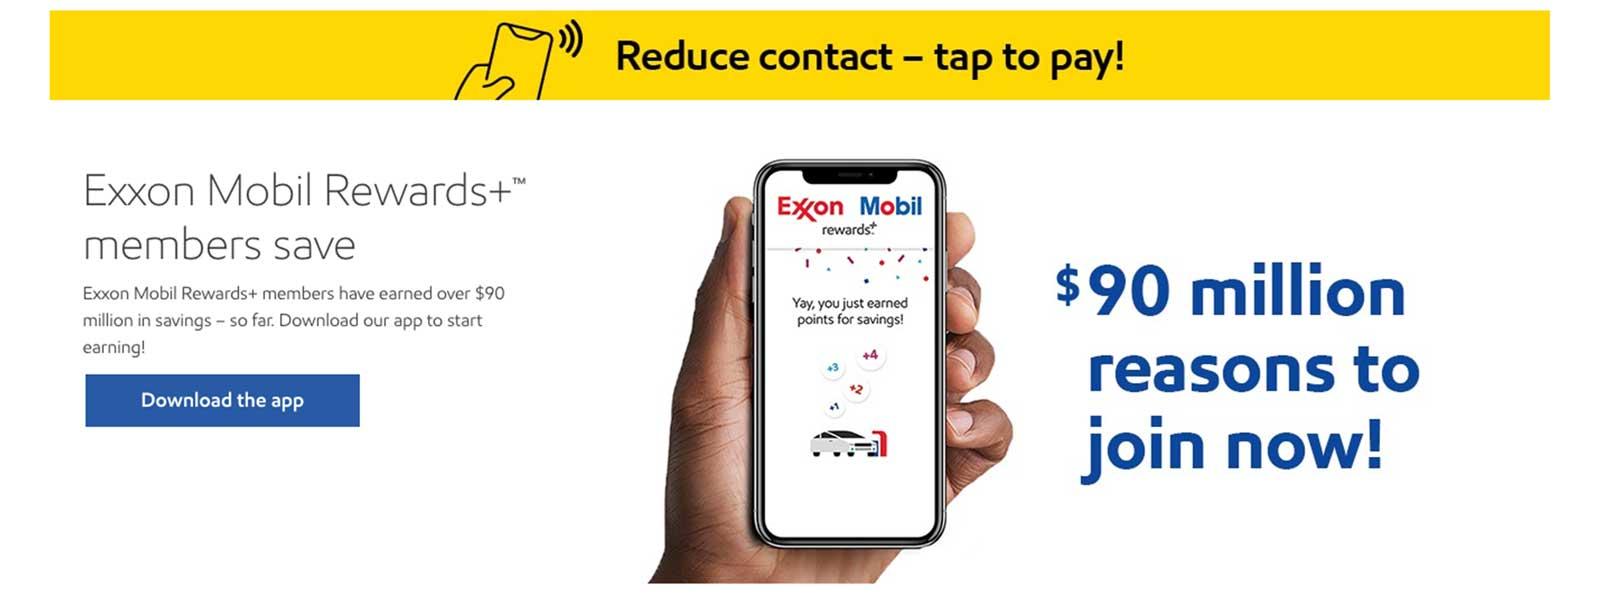 exxon_mobil_rewards_+_loyalty_savings_app